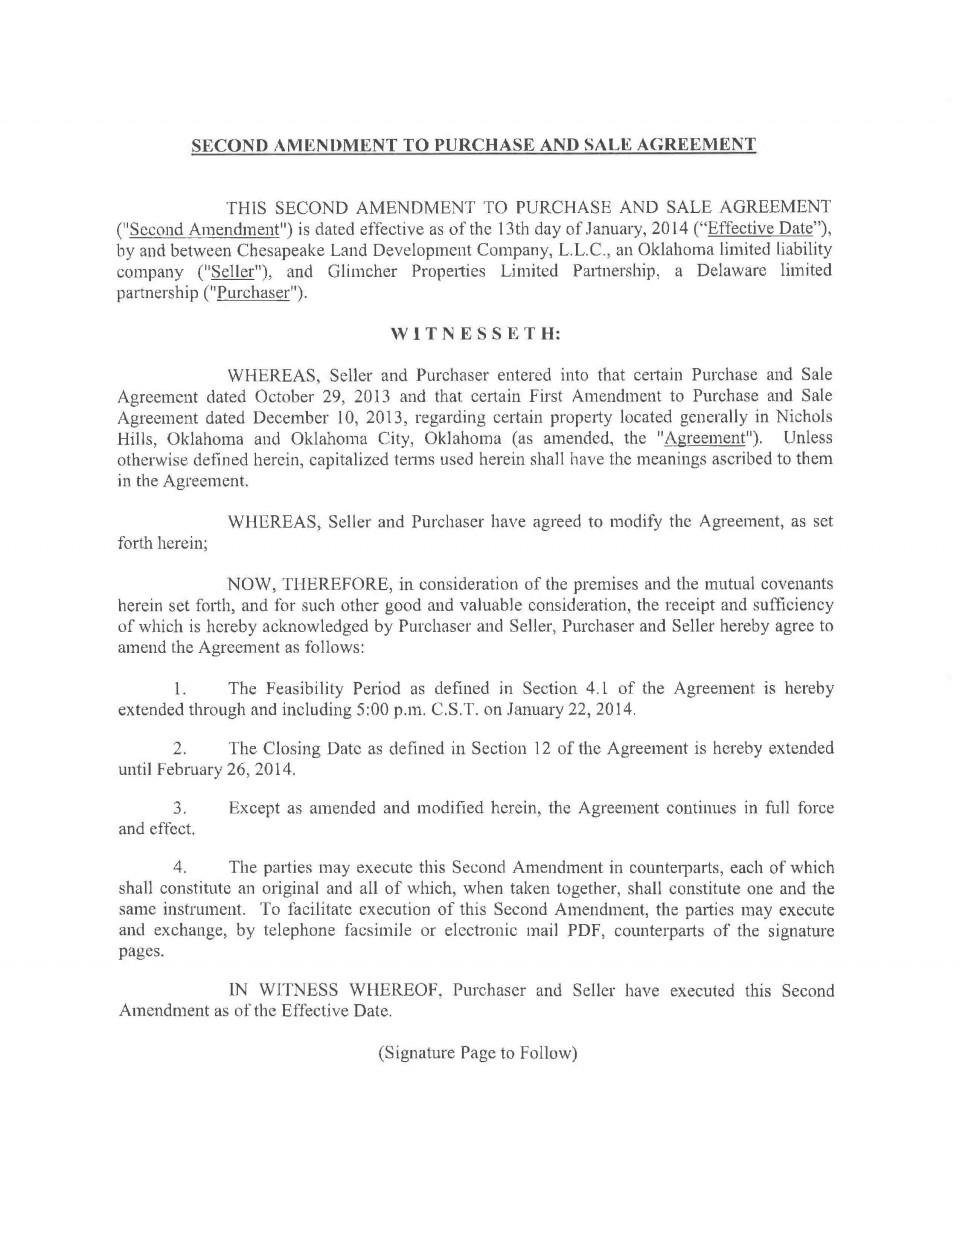 007 Stupendou Buy Sell Agreement Llc Sample Example 960